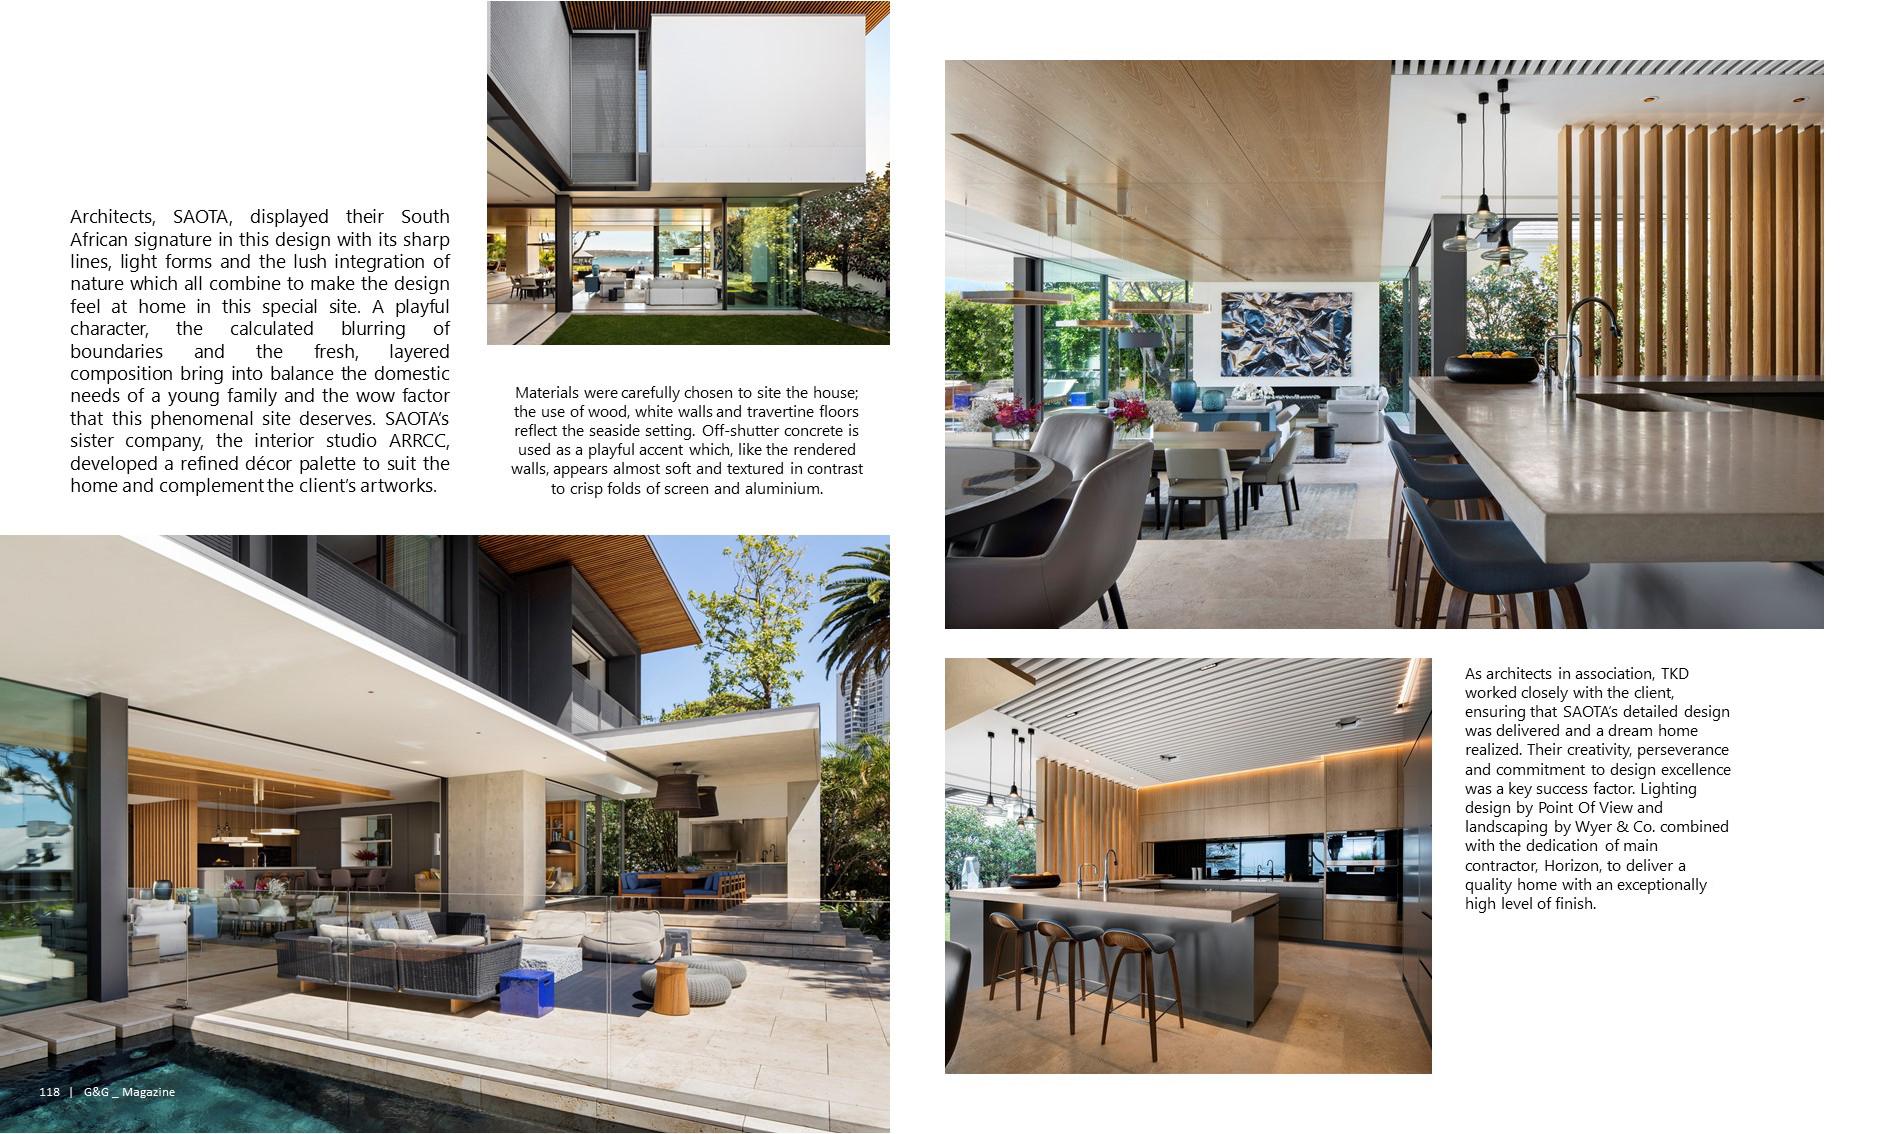 2018_05_01_IT_G&Gmagazine_DoubleBay_page118&119.jpg